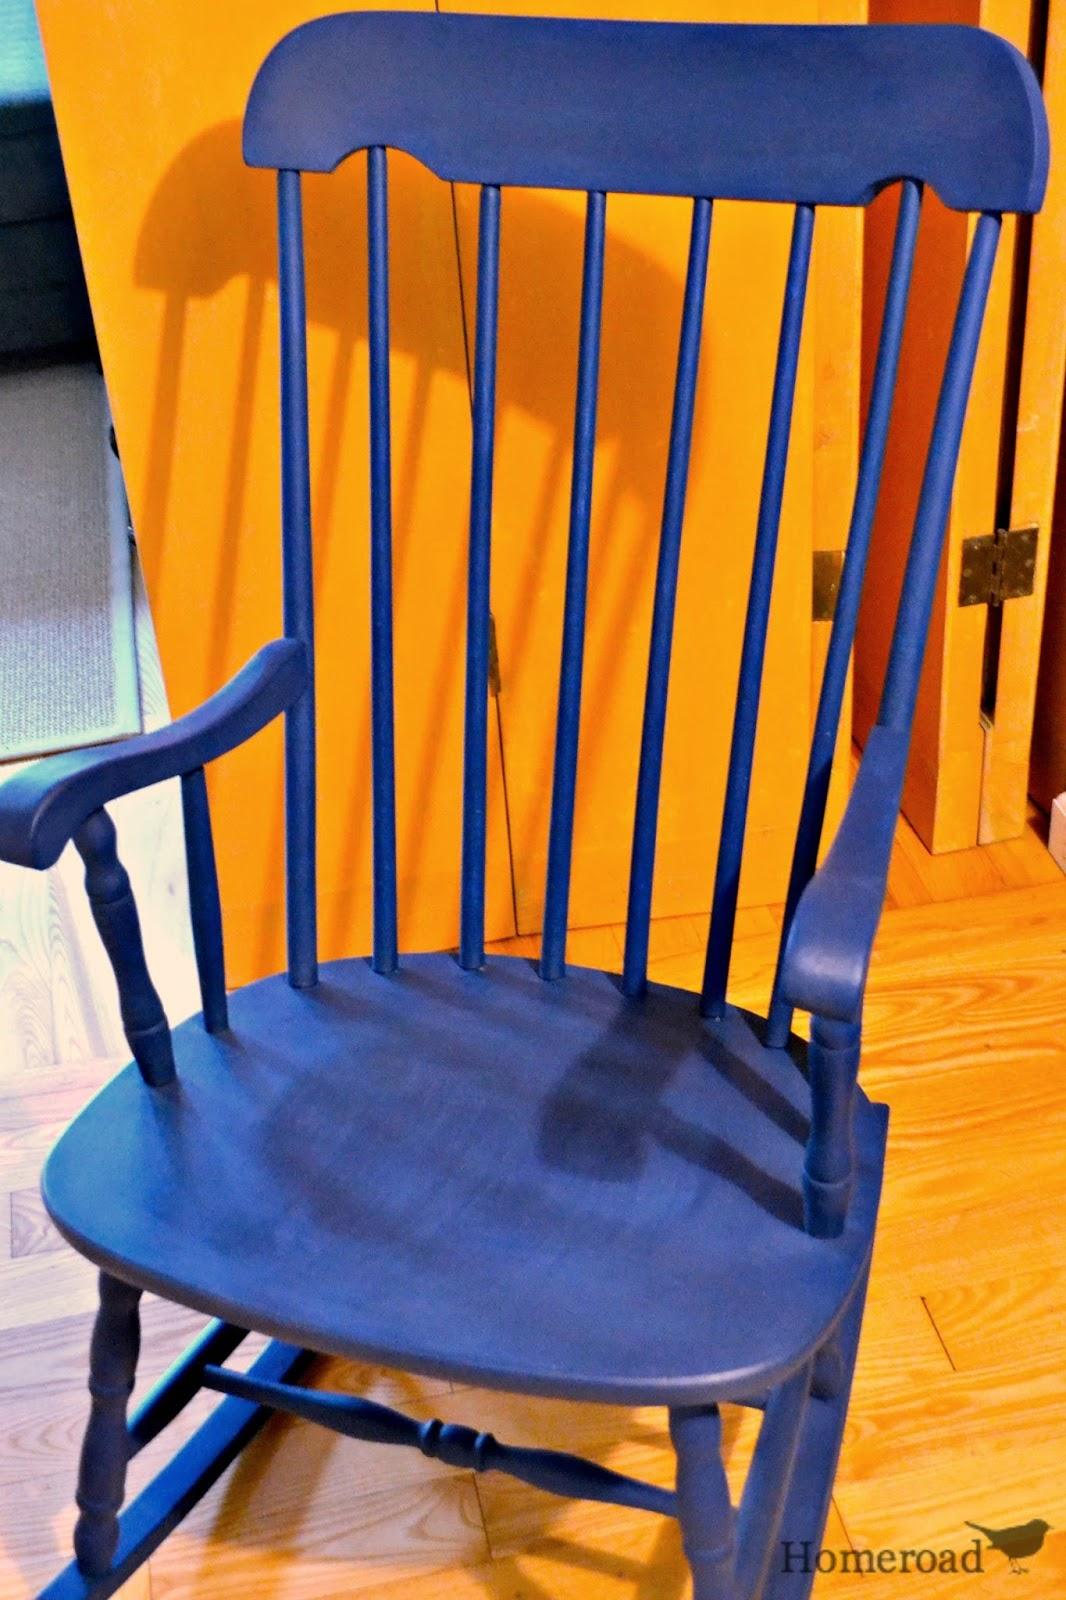 Superbe Rocking Chair With Grain Sack Cushion